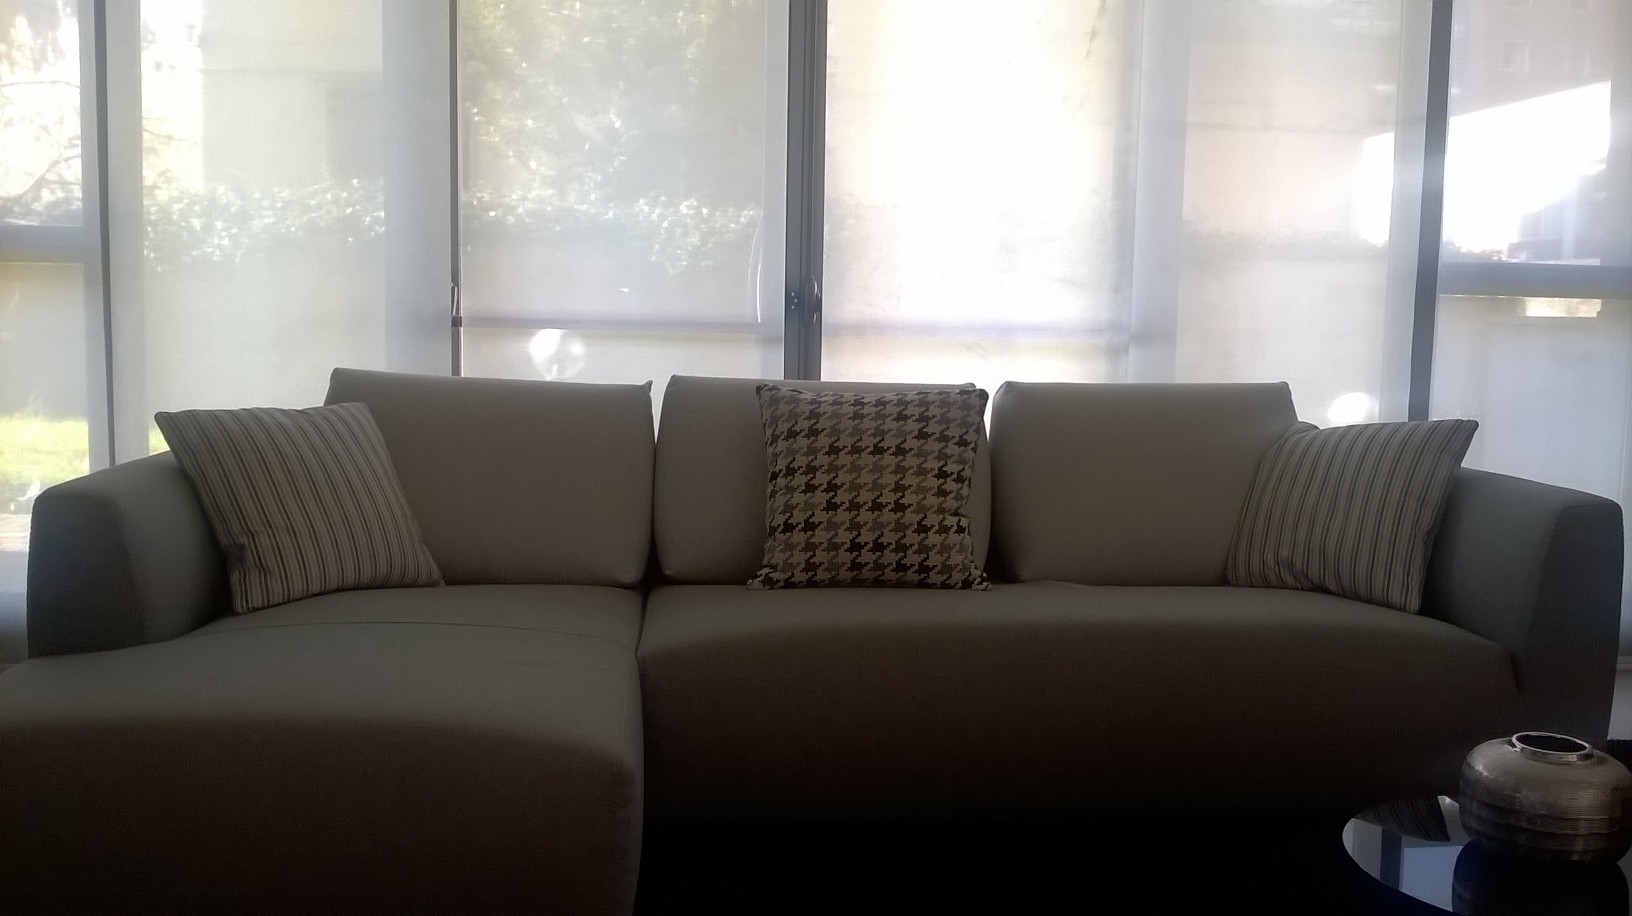 Divano bodema anyway tessuto divani a prezzi scontati - Divano profondita 75 ...